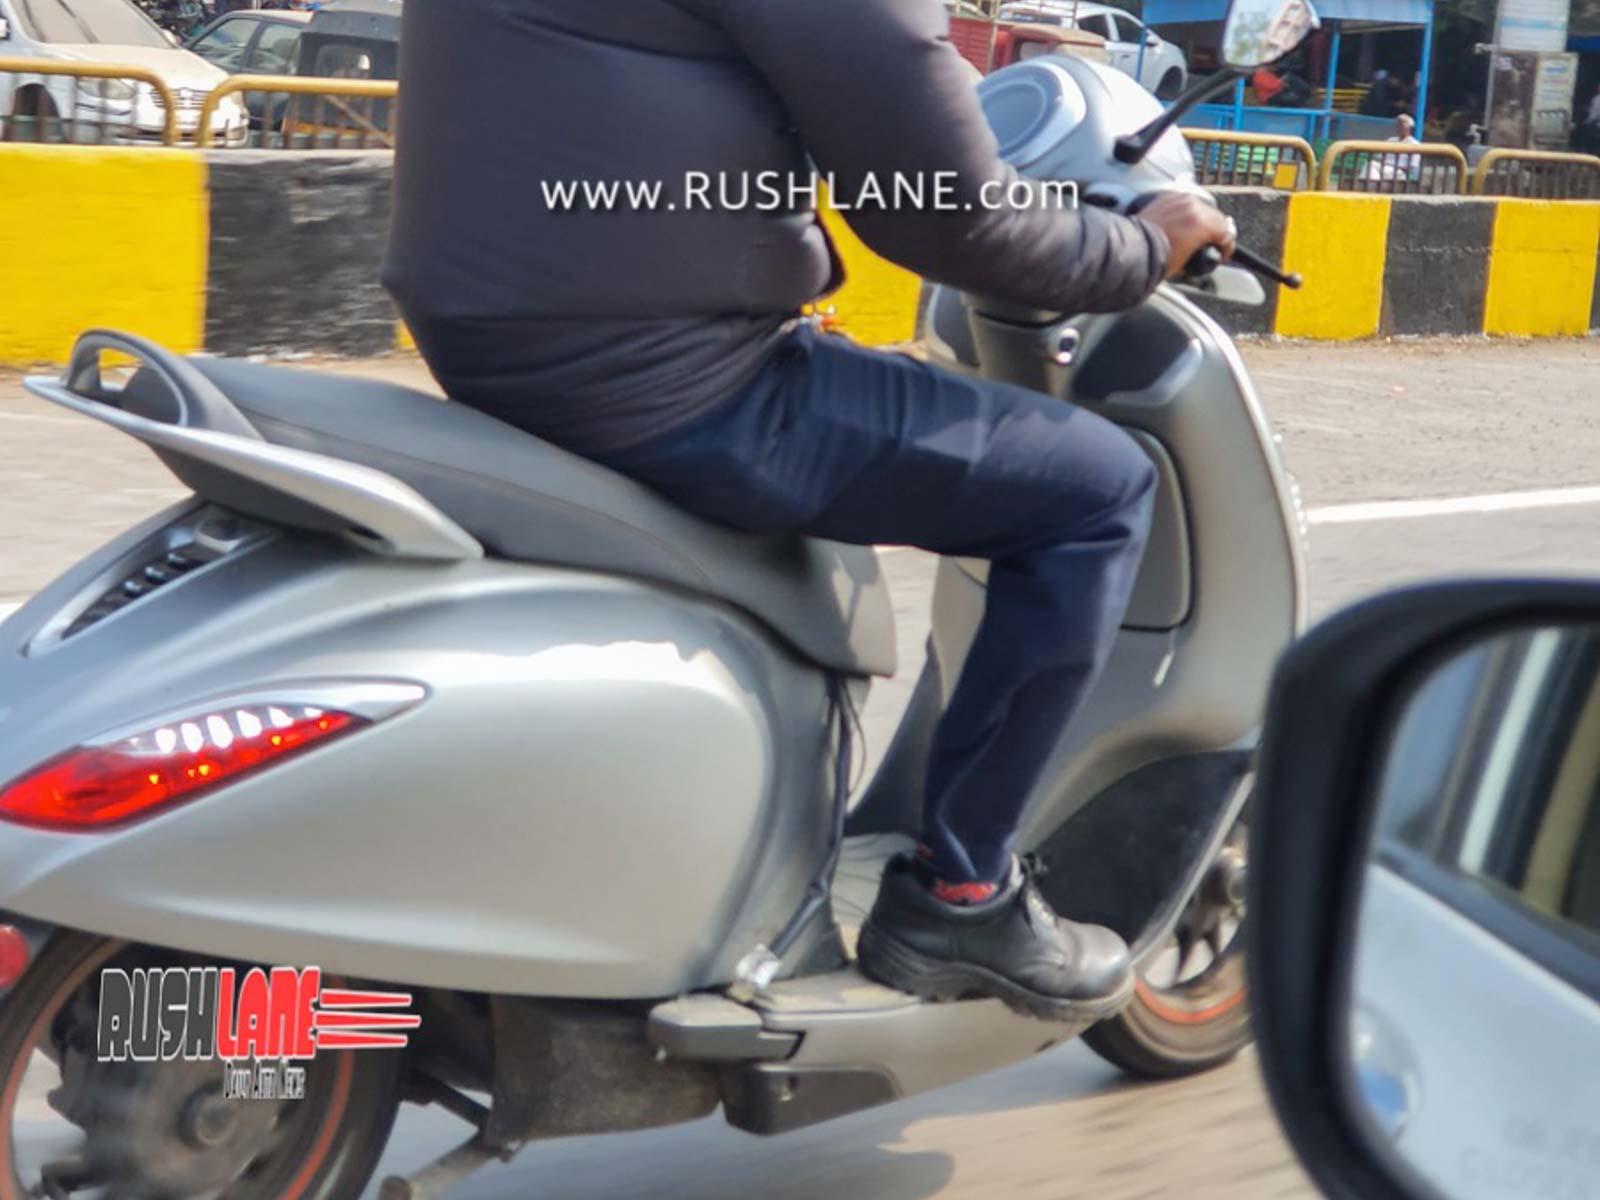 Bajaj Chetak electric scooter spied testing